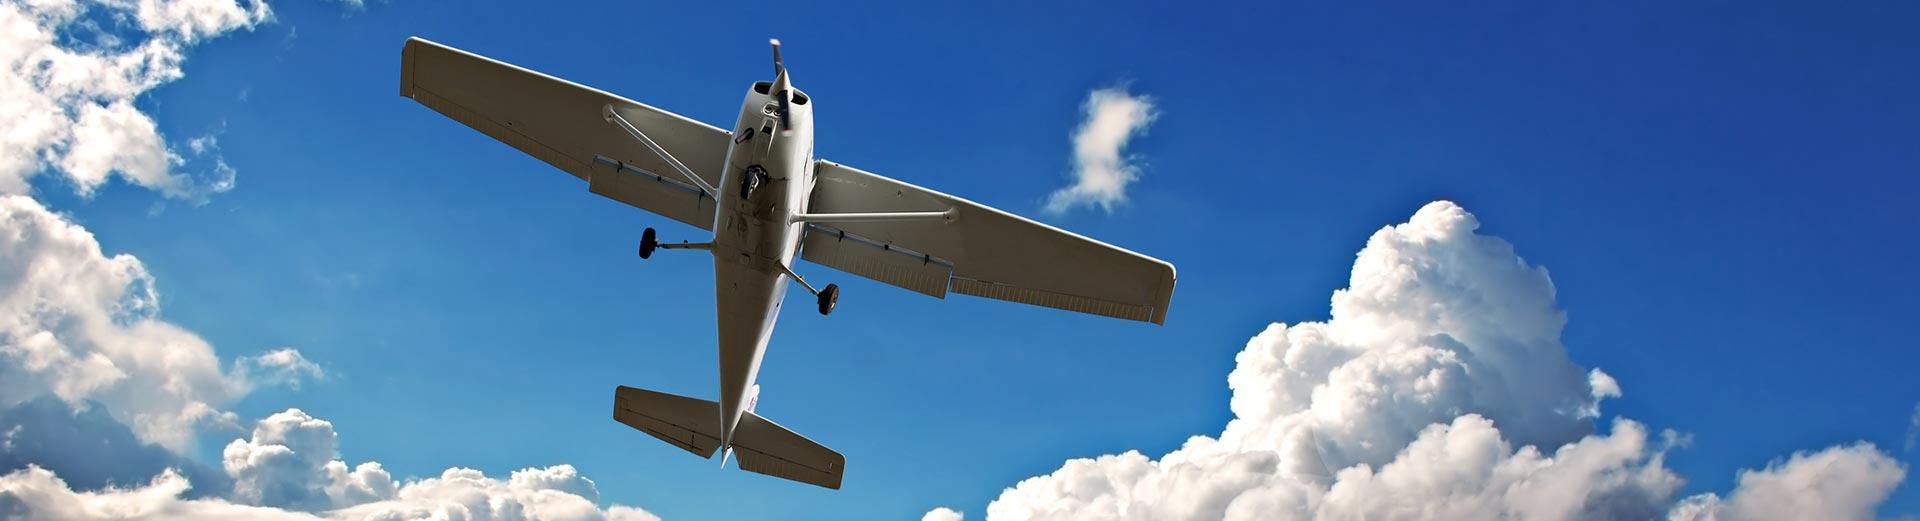 Airplane Aerial Patrol Services